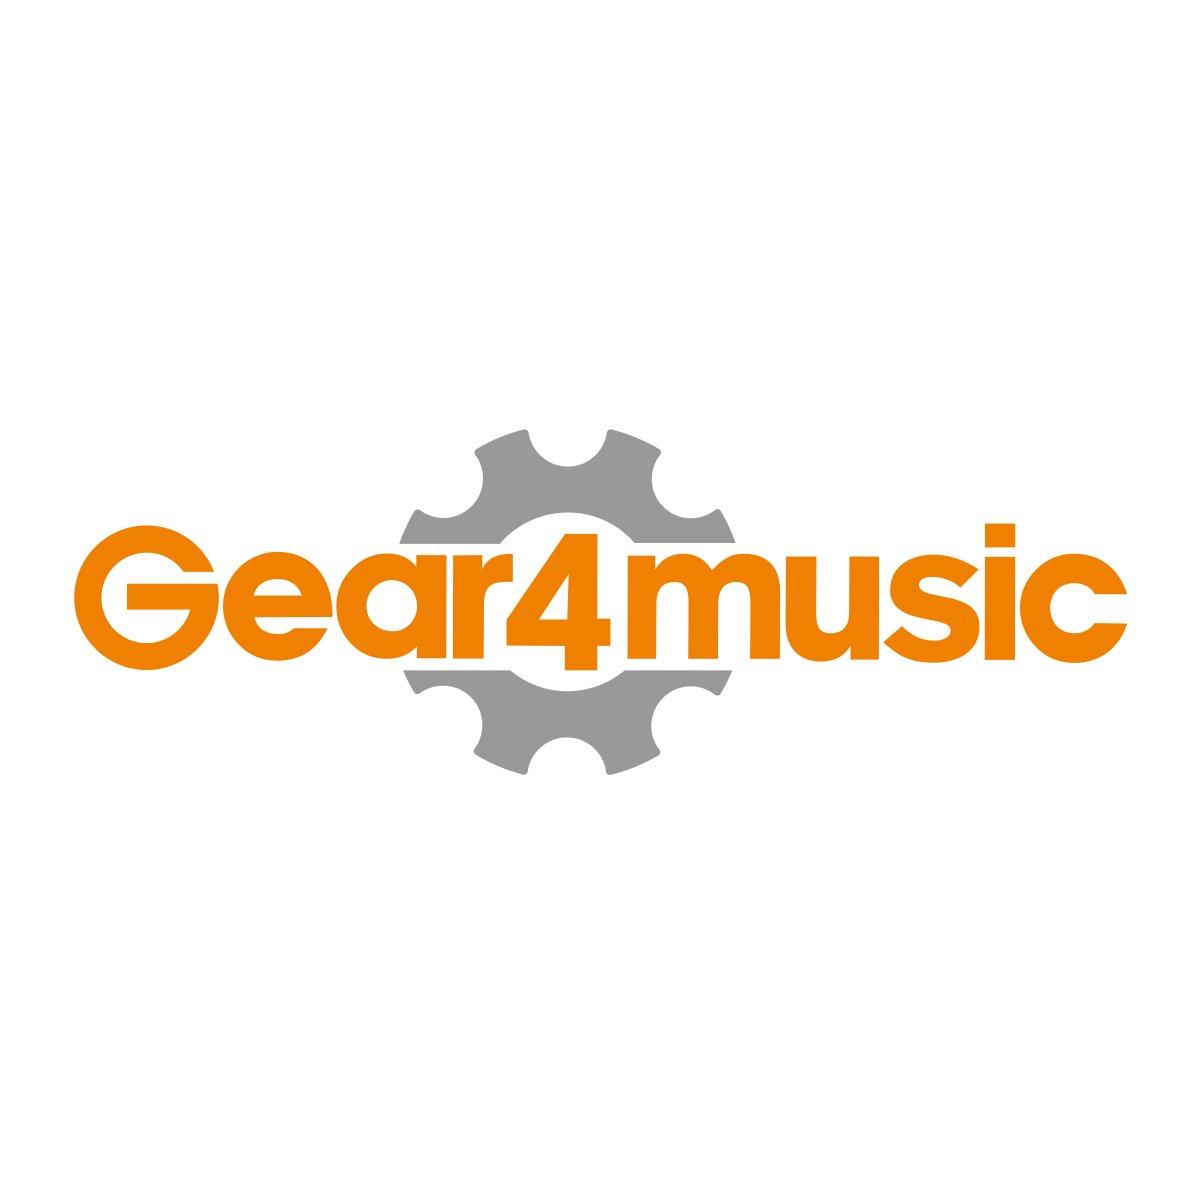 36 x 3w LED Par Can by Gear4music